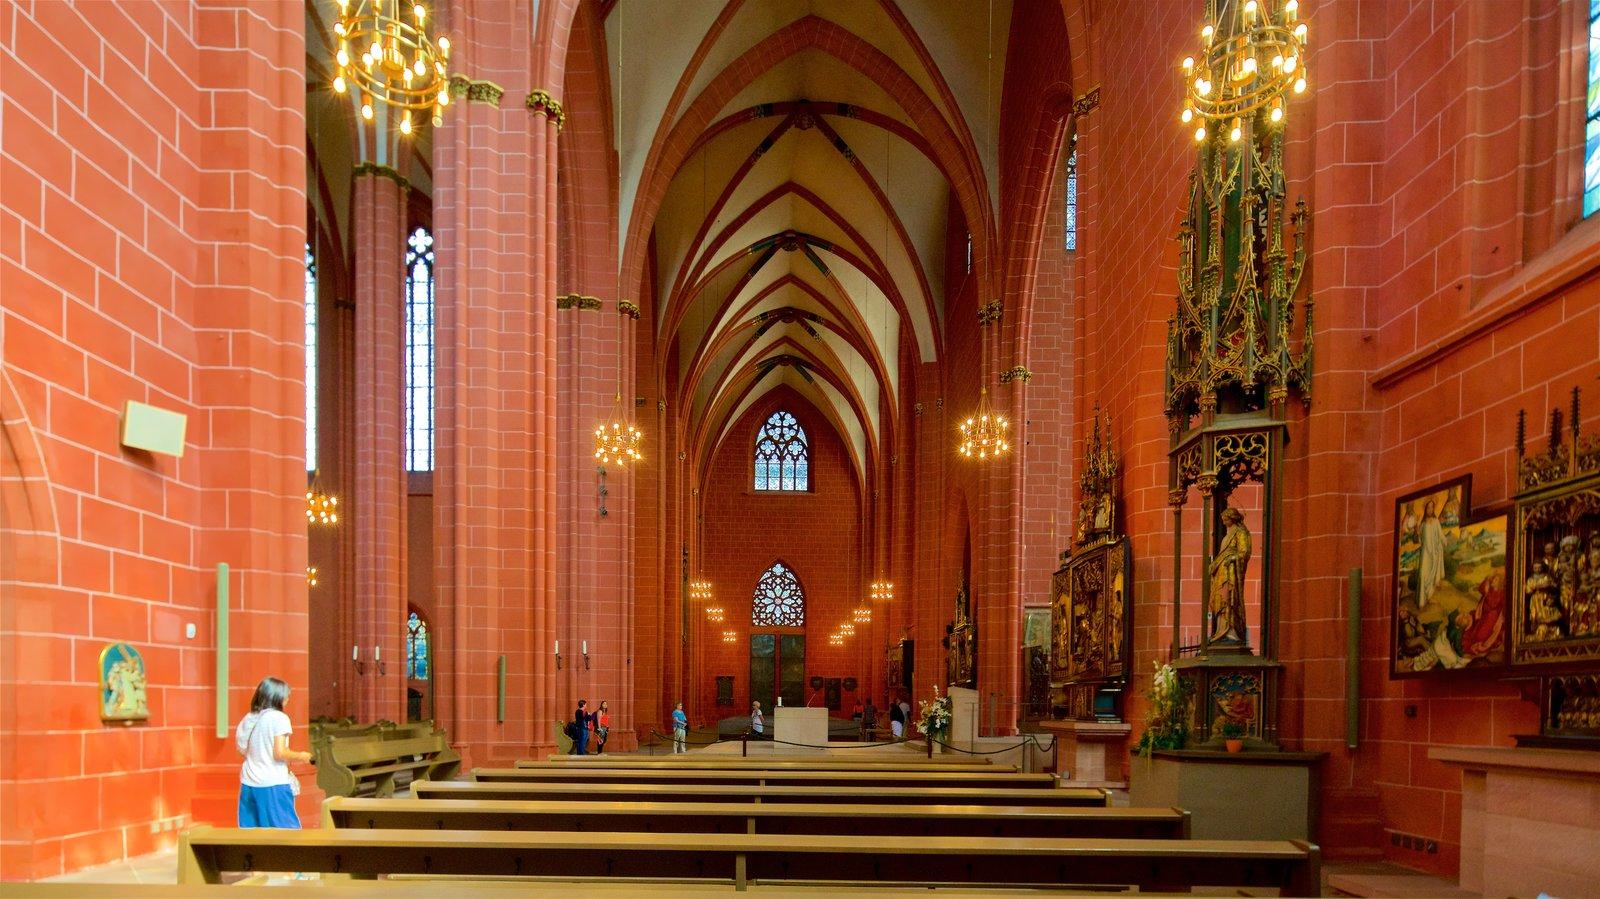 Interior Frankfurt frankfurt cathedral pictures view photos images of frankfurt